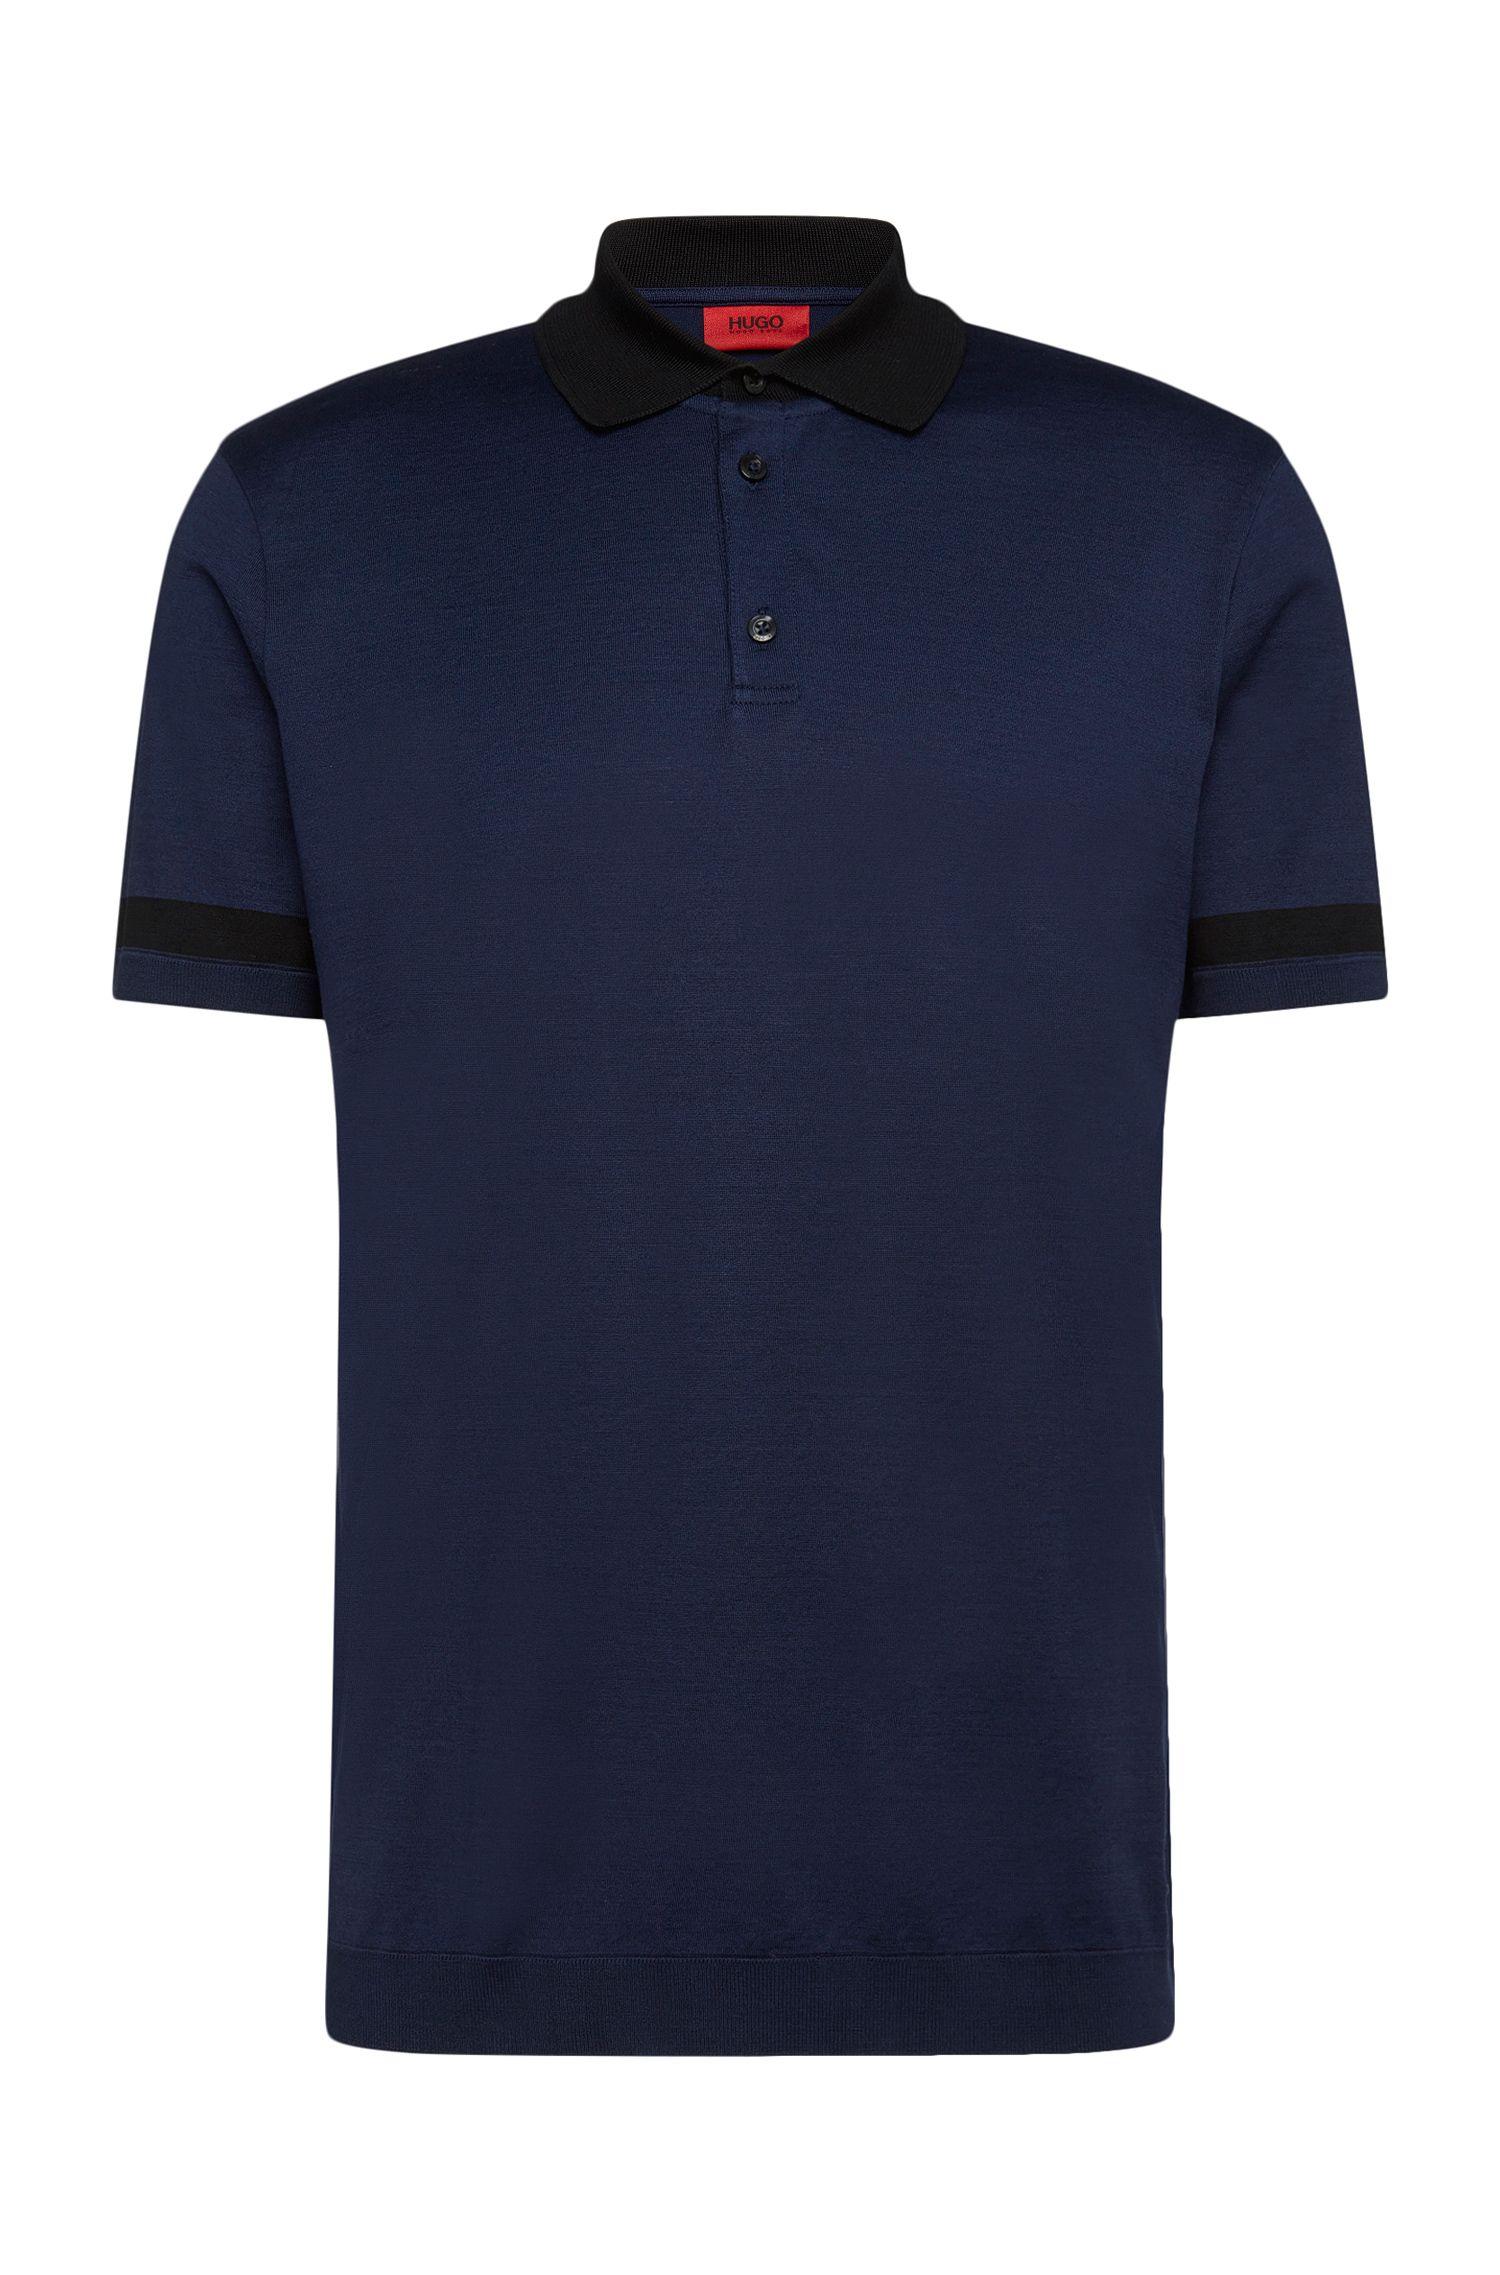 Regular-Fit Poloshirt aus Stretch-Baumwolle: 'Dharp'